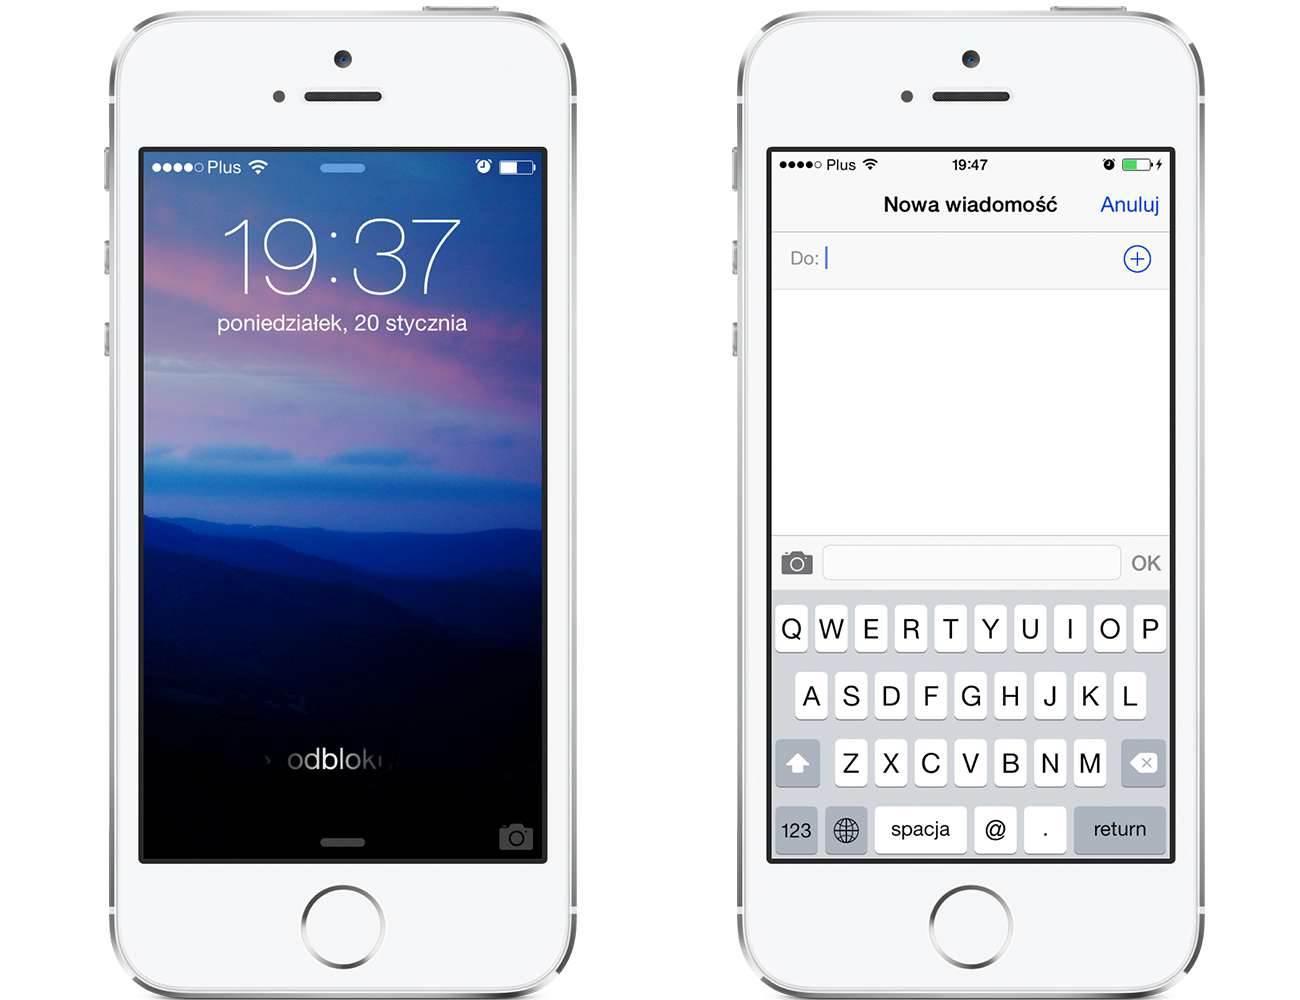 iOS7.1b4.2